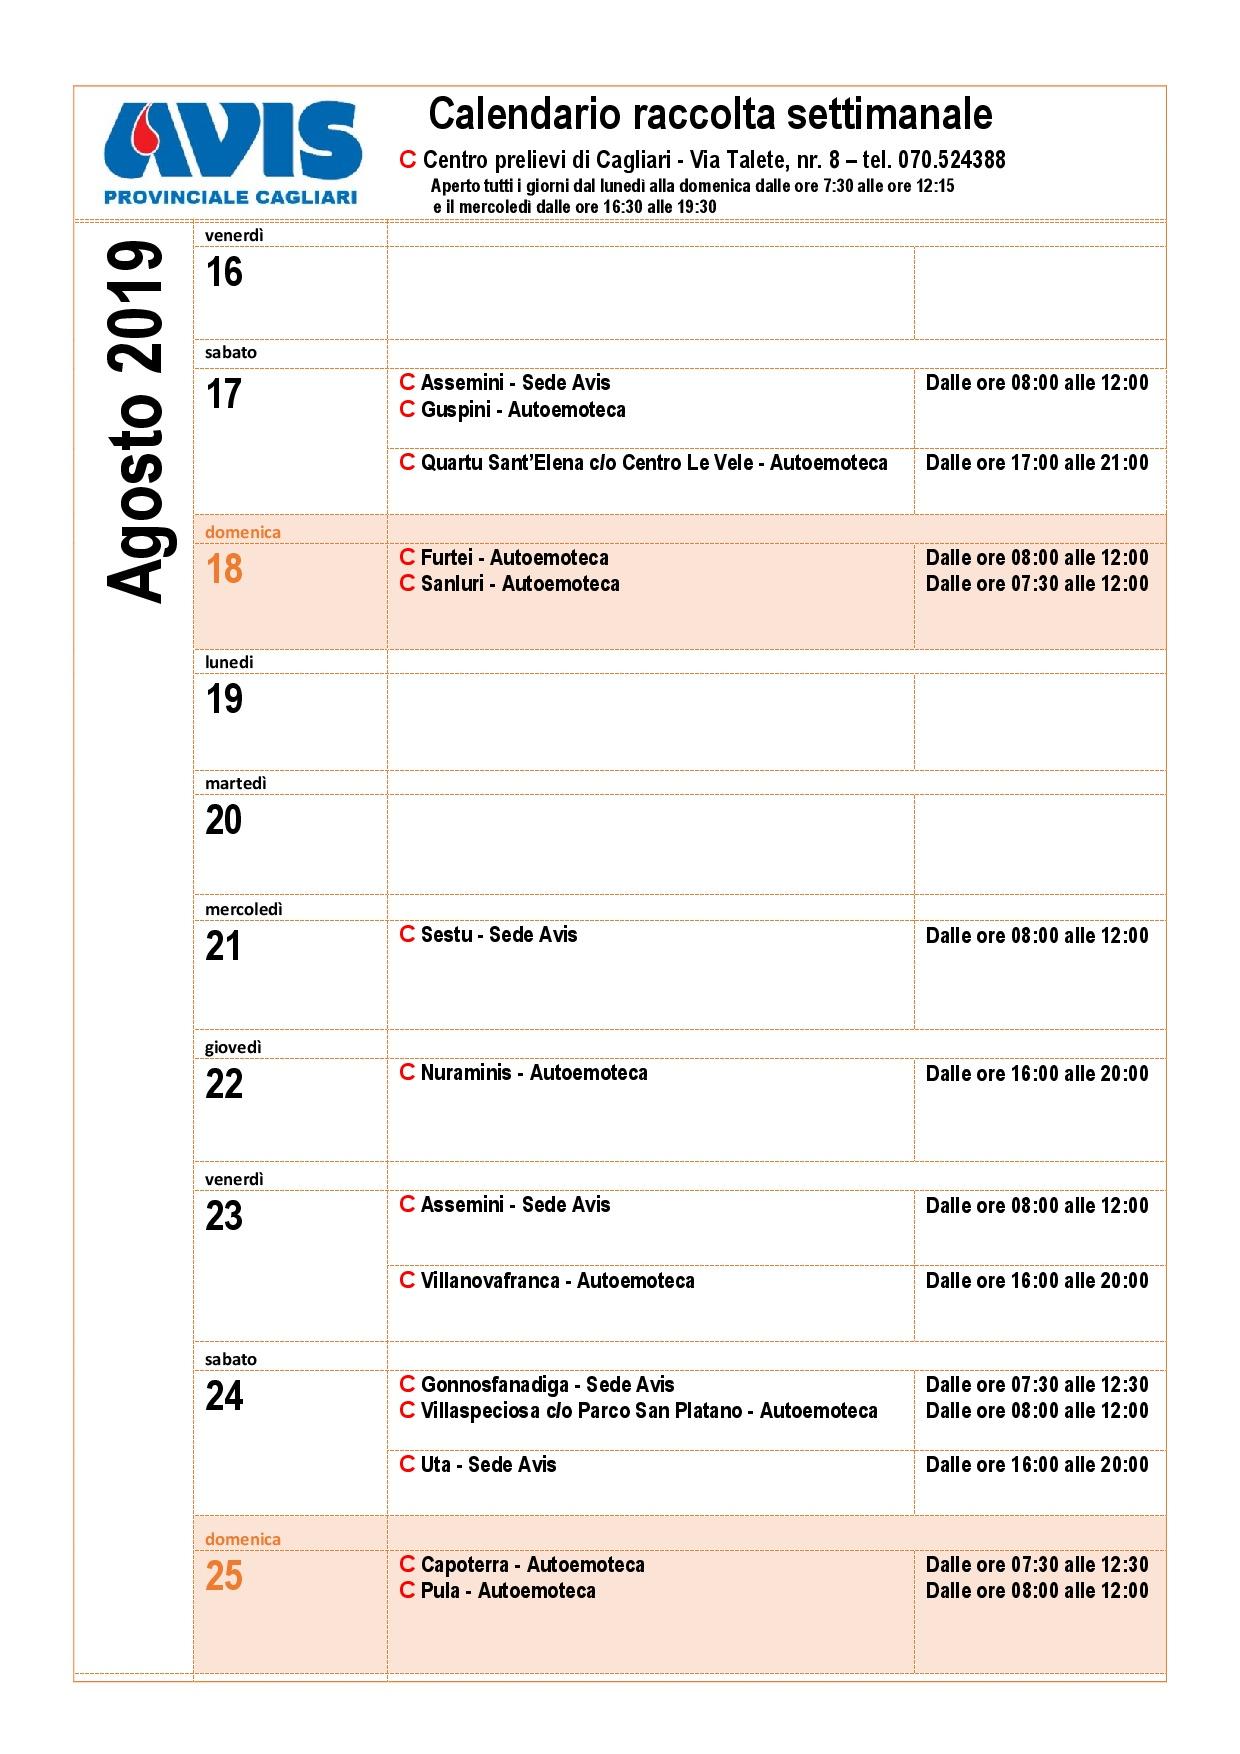 Calendario Avis.Calendario Prelievi Avis Provinciale Cagliari